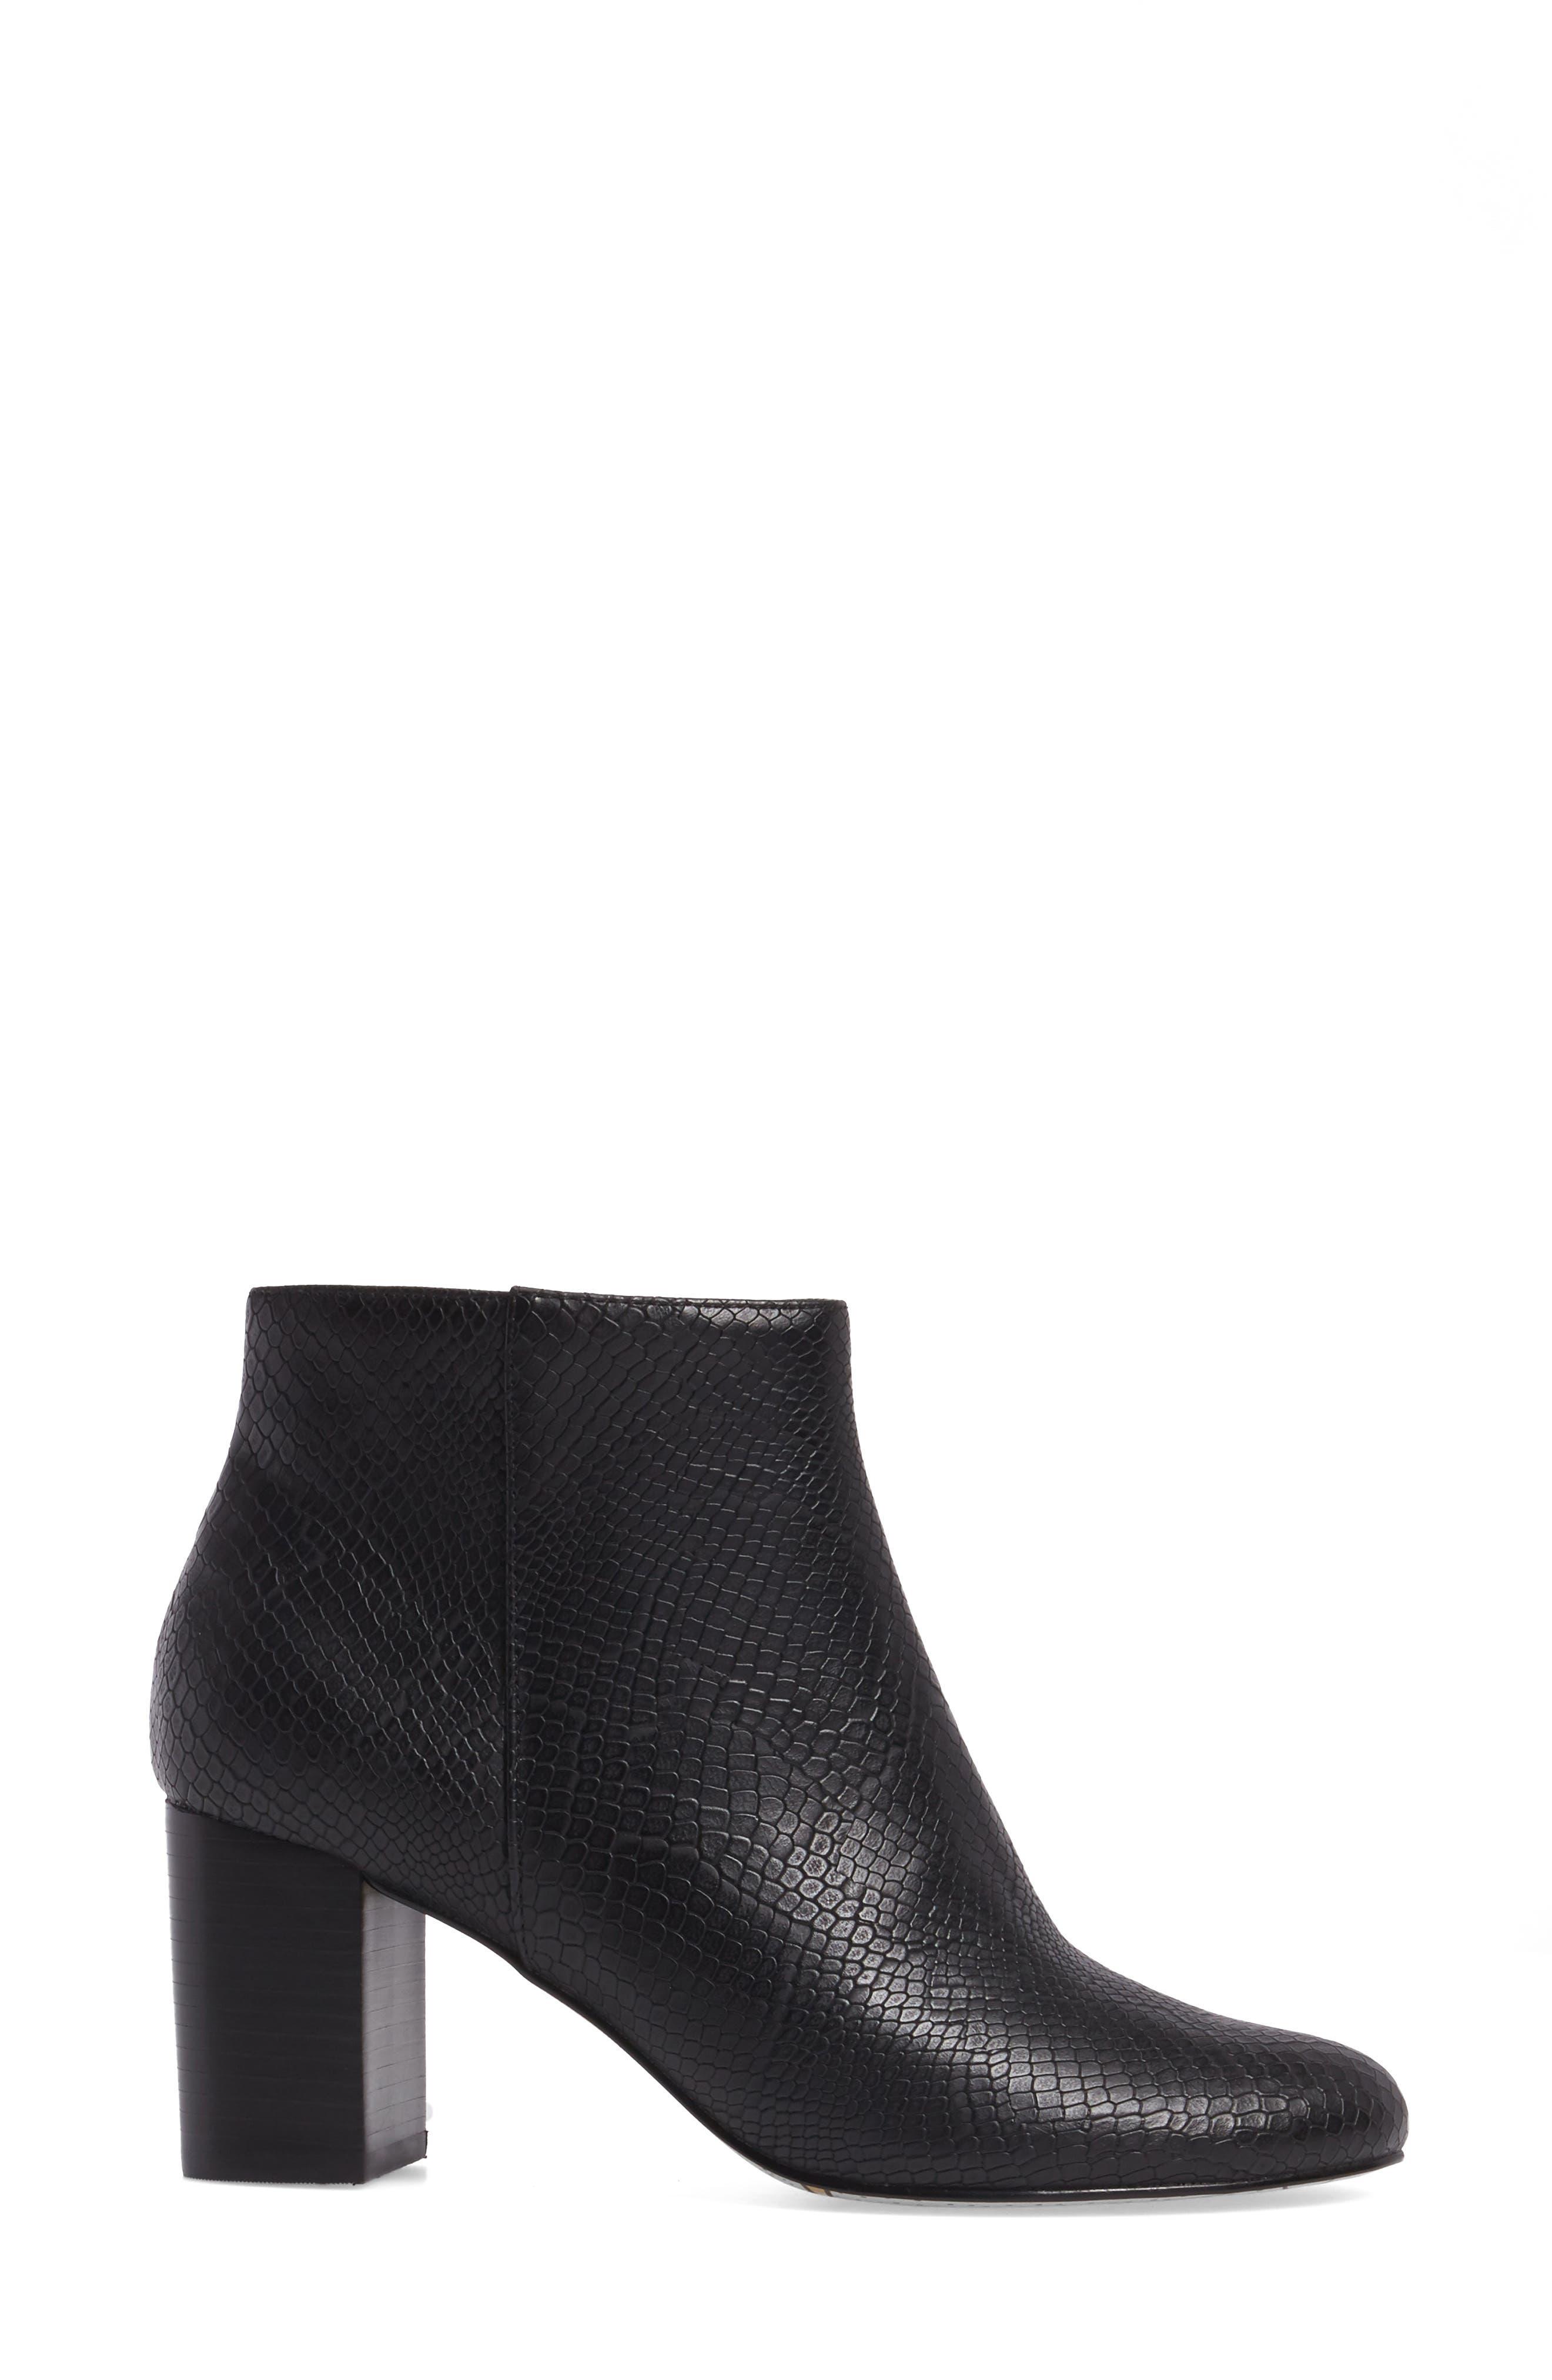 Klaudia II Block Heel Bootie,                             Alternate thumbnail 3, color,                             Black Printed Leather